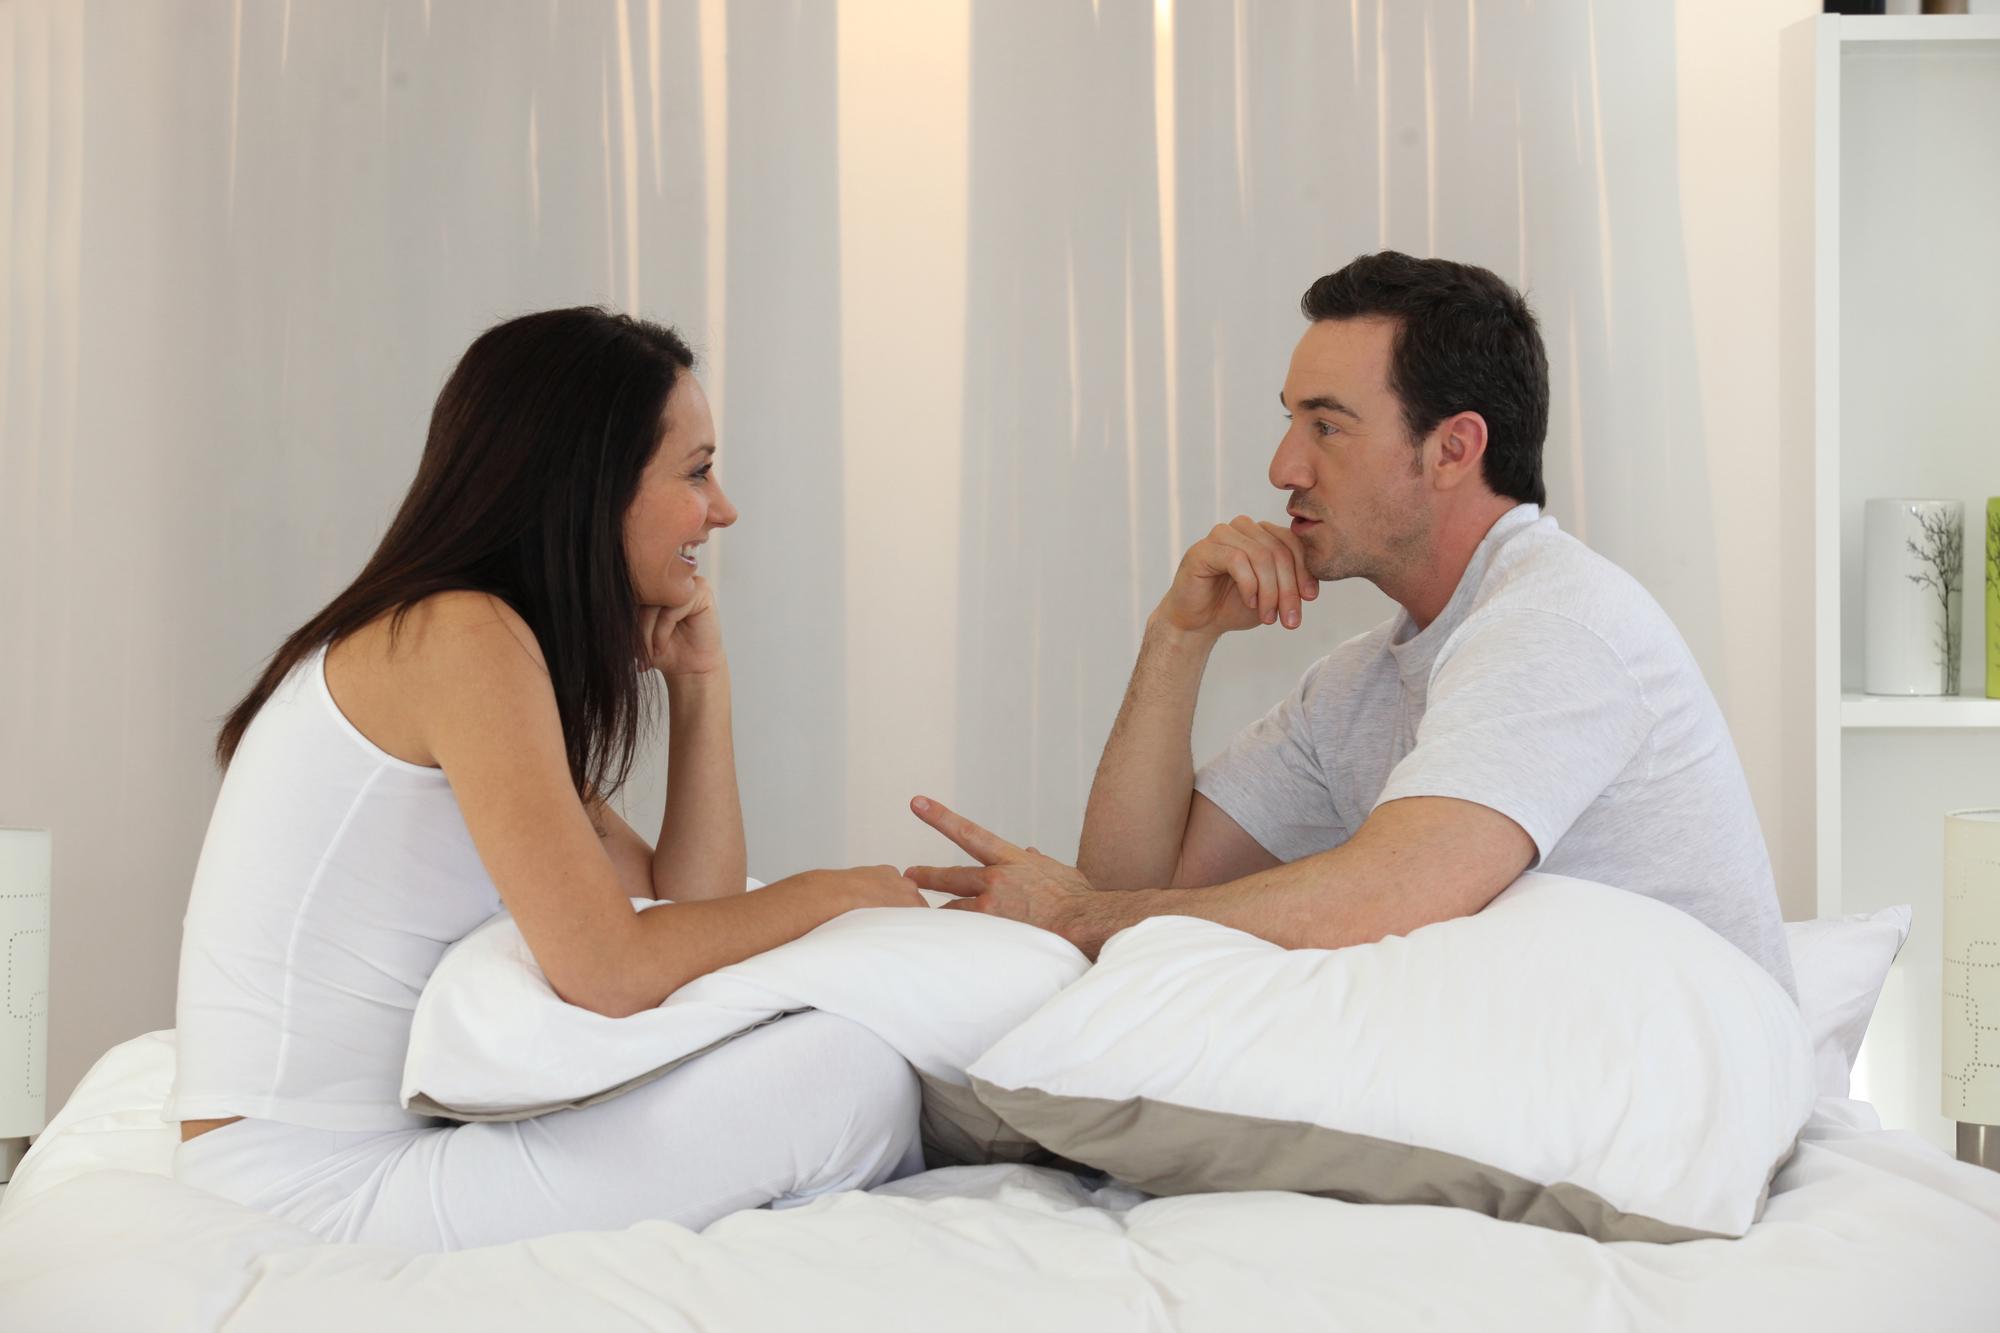 Couples_Communicating_Kelly_Chisholm.jpg